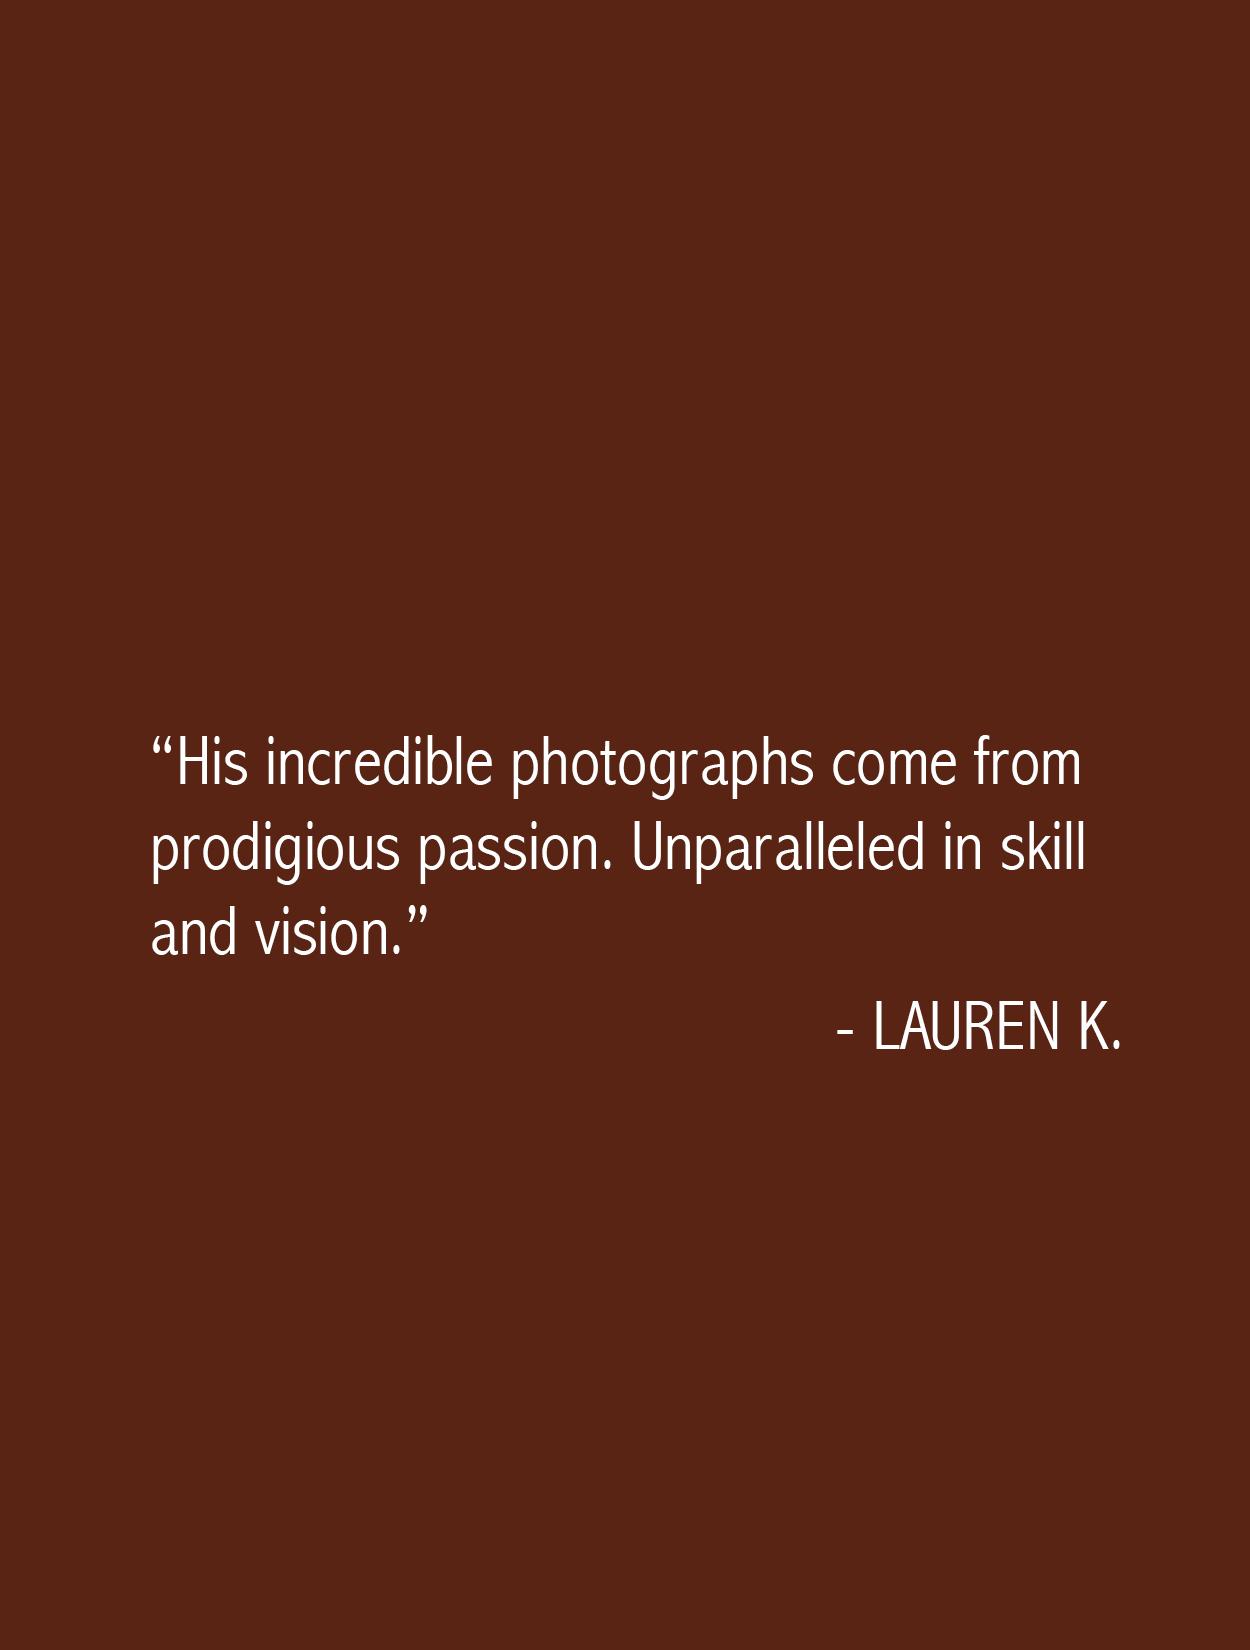 Lauren Testimonial Anh-Viet Dinh Photography